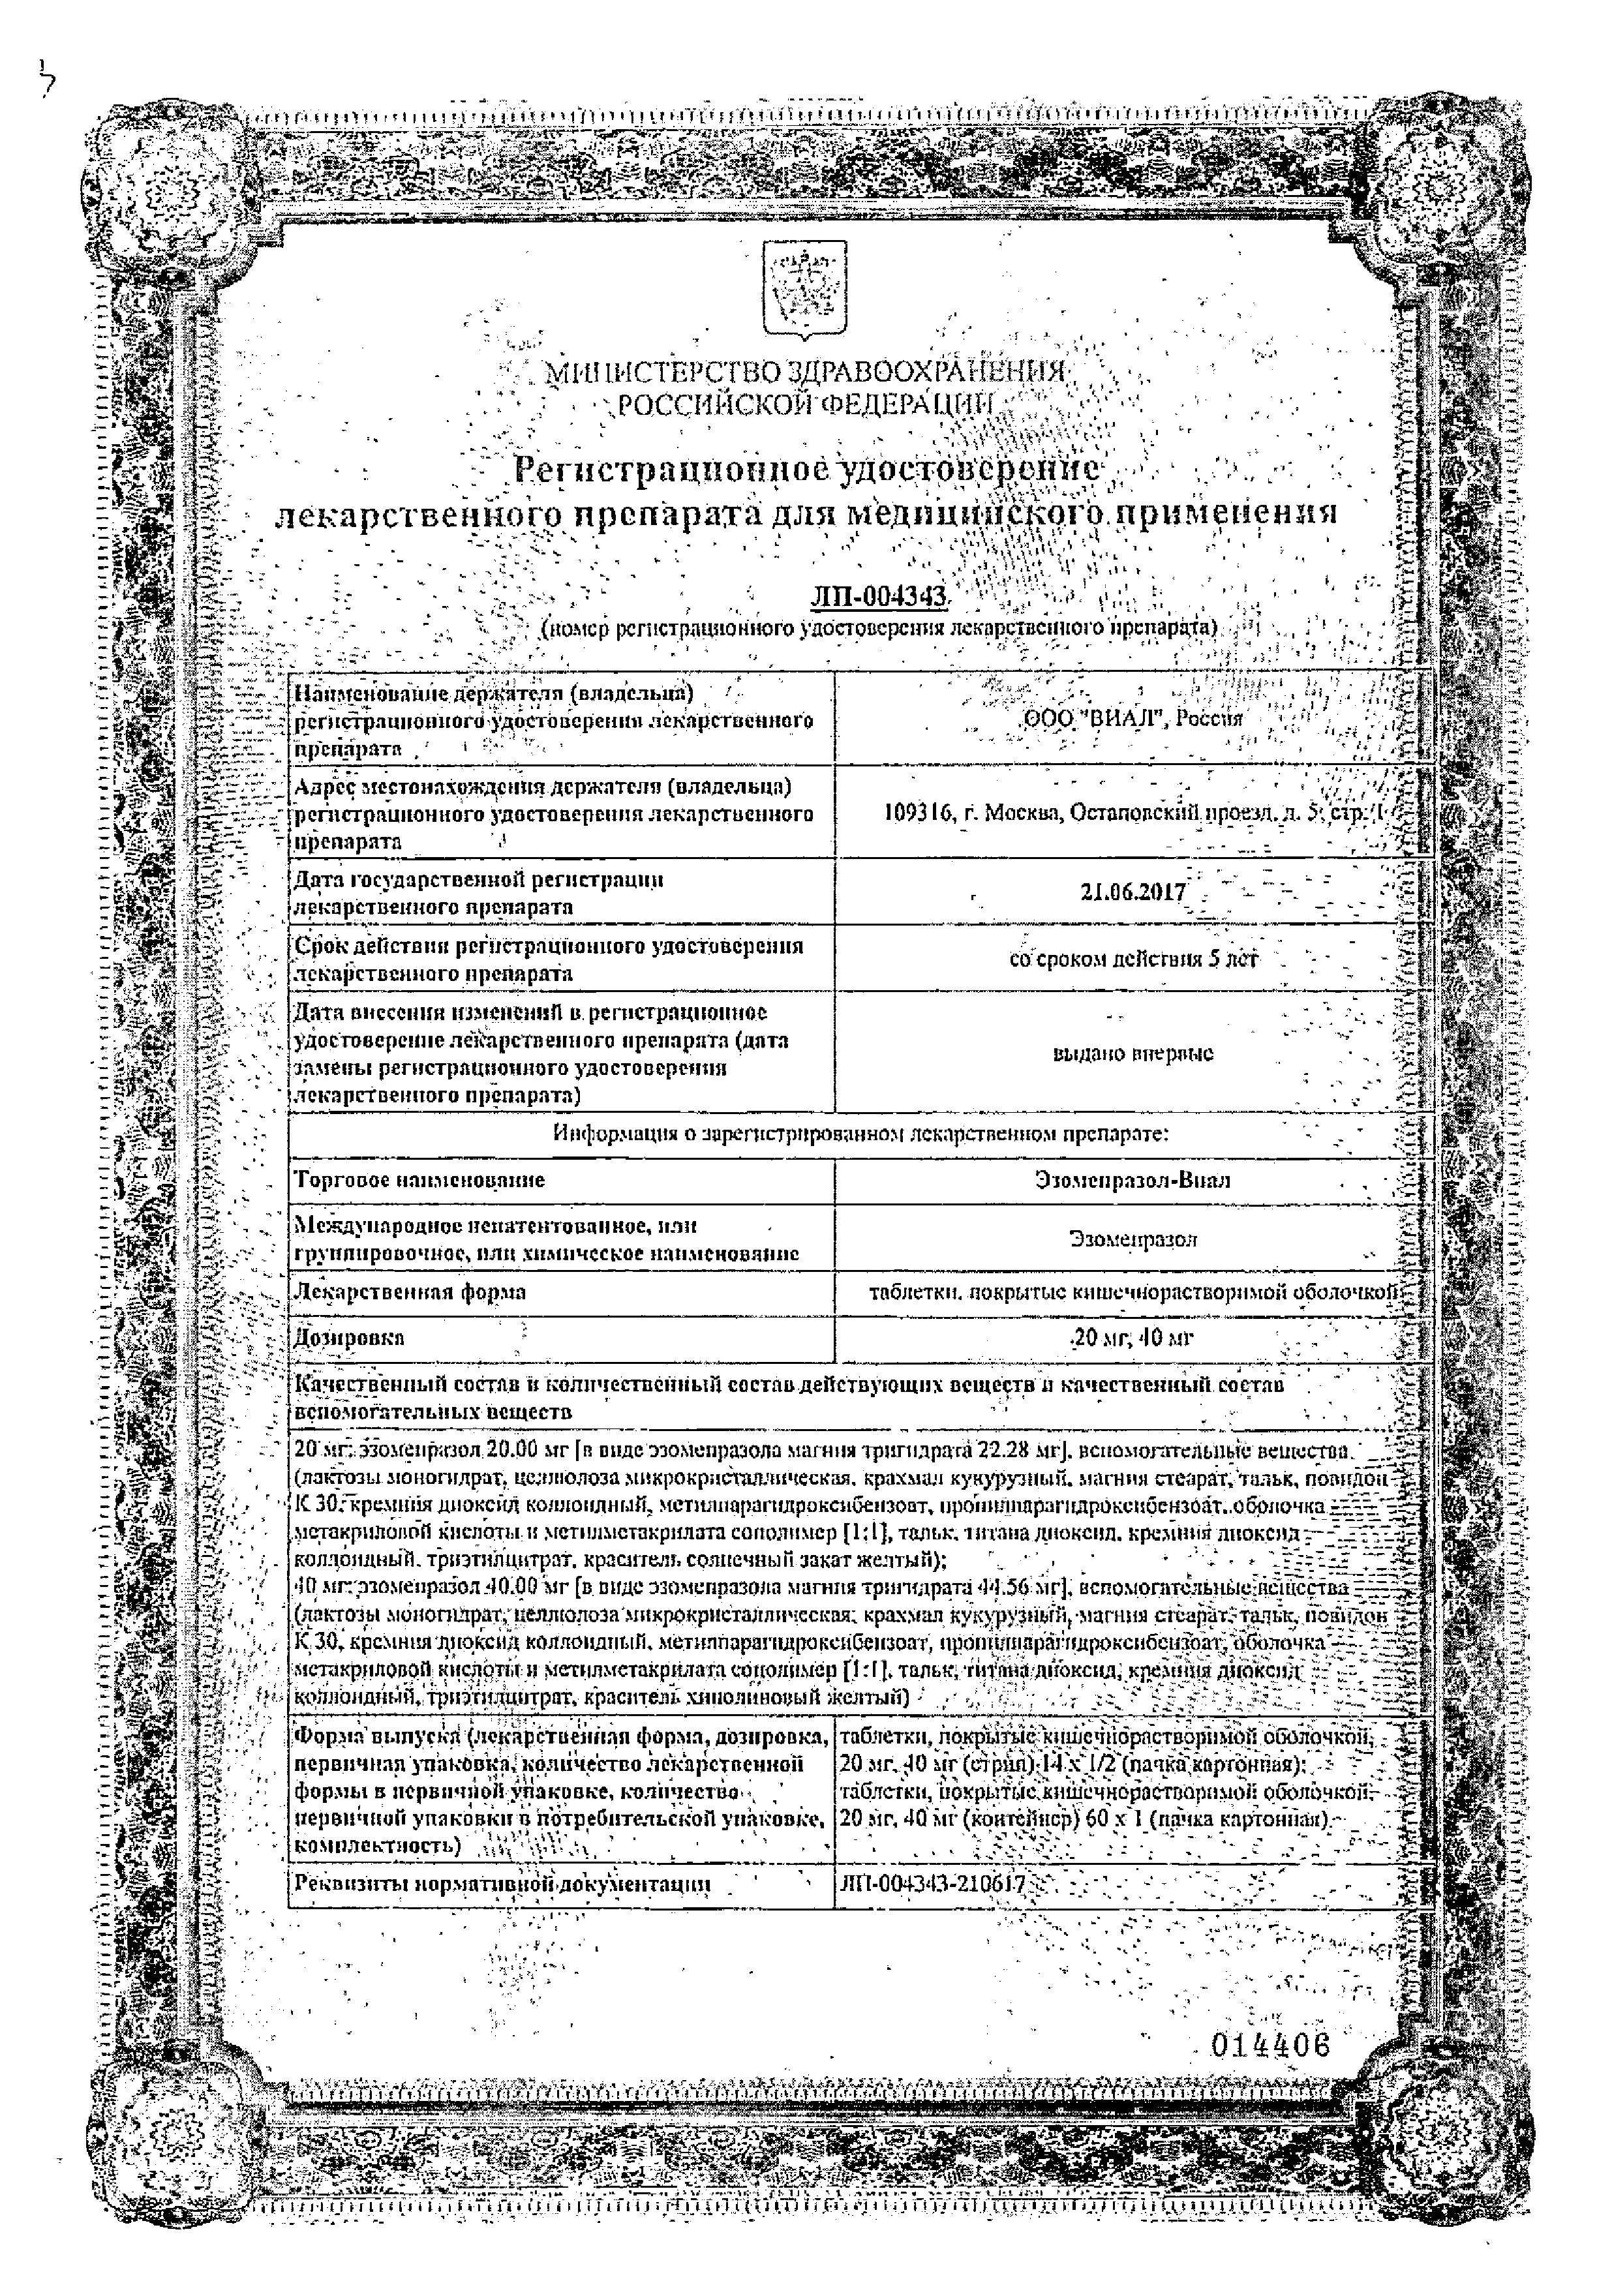 Эзомепразол-Виал сертификат